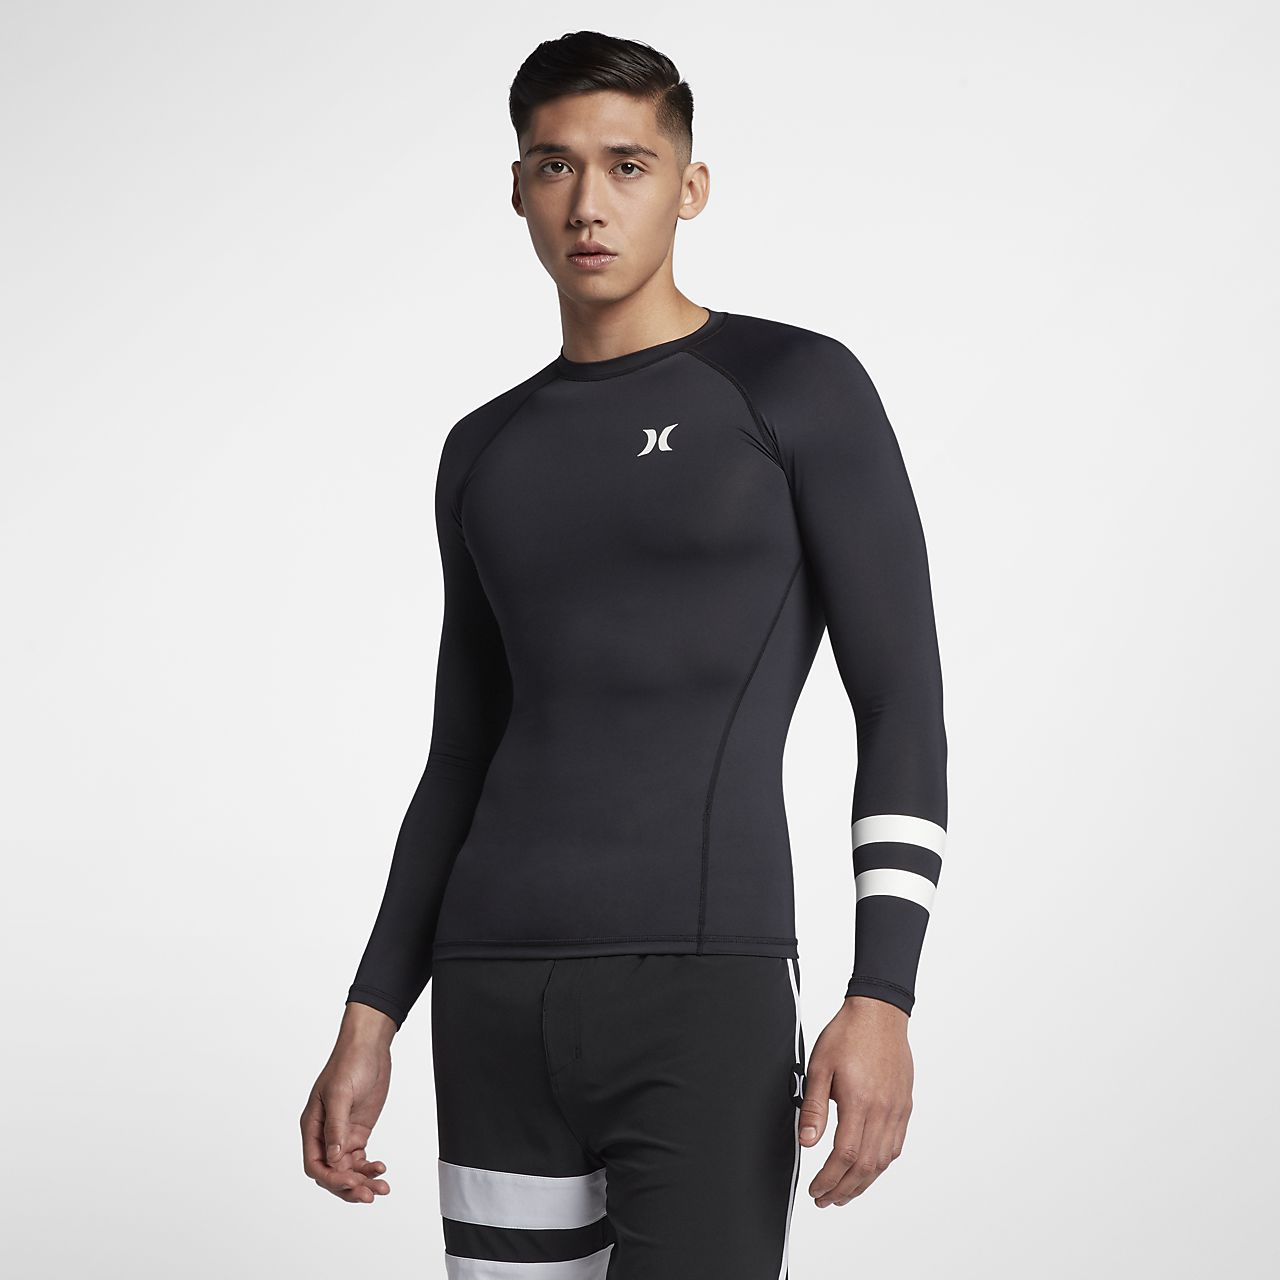 Męska koszulka surfingowa z długim rękawem Hurley Pro Light